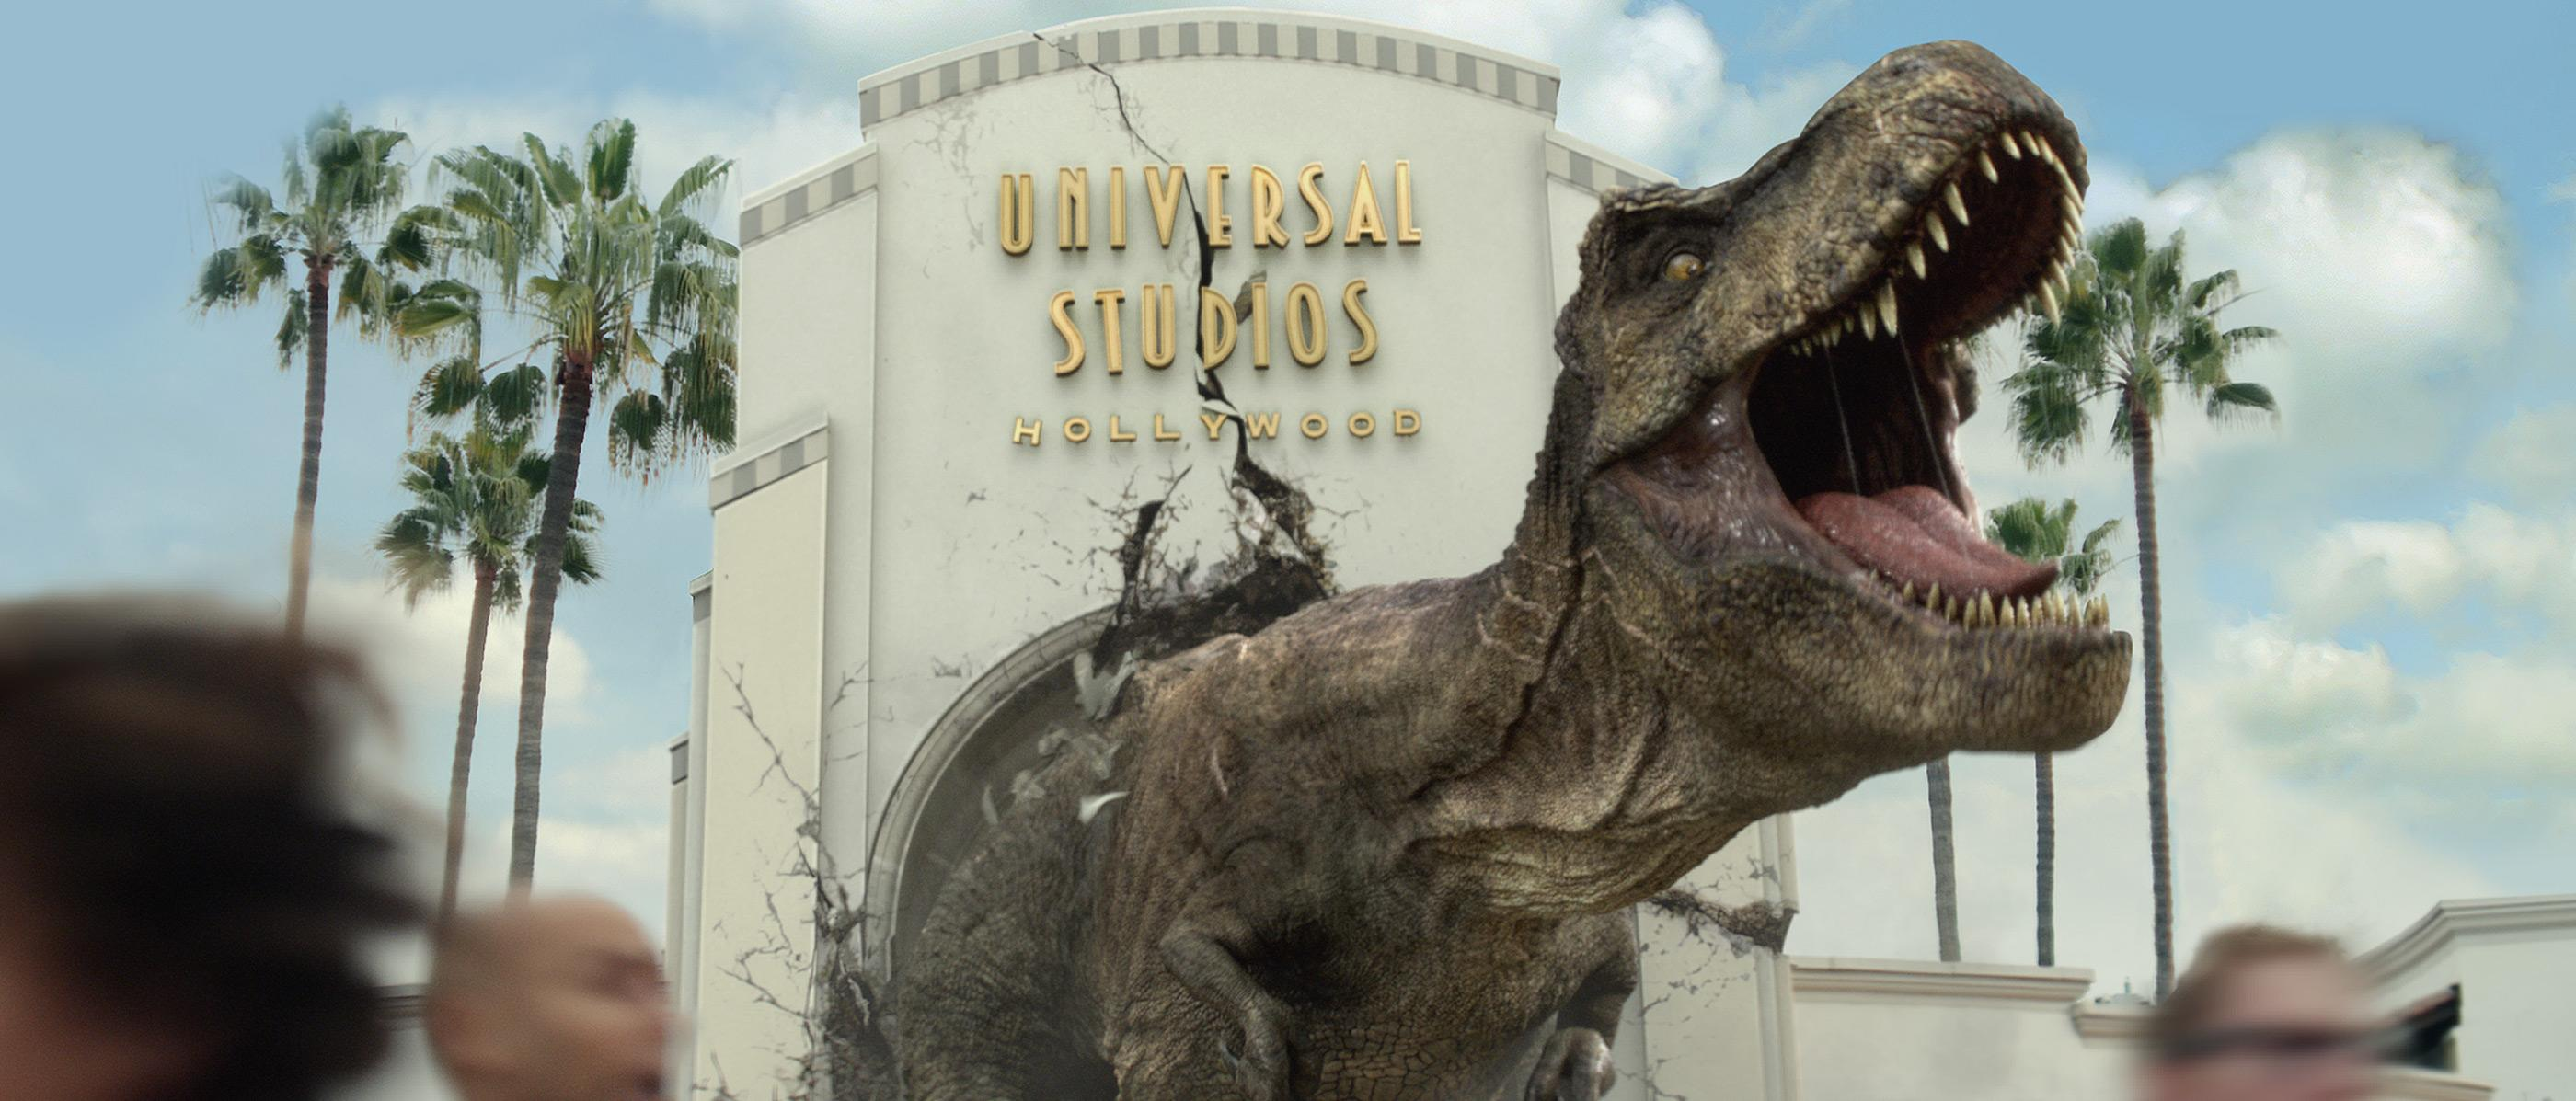 Will Jurassic World Save Disney's Biggest Theme Park Rival?